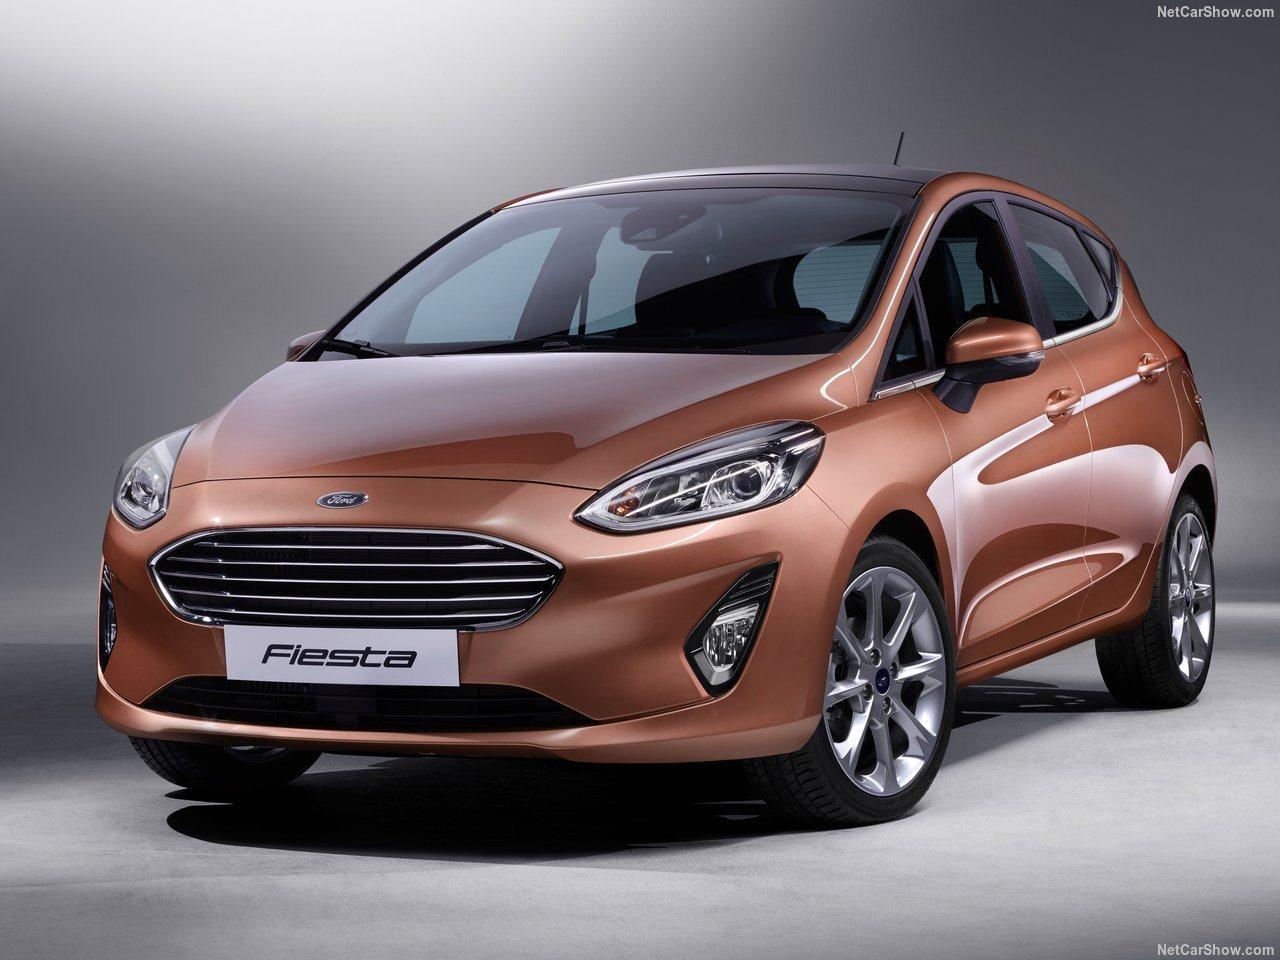 Ford-Fiesta-2017-1280-02.jpg